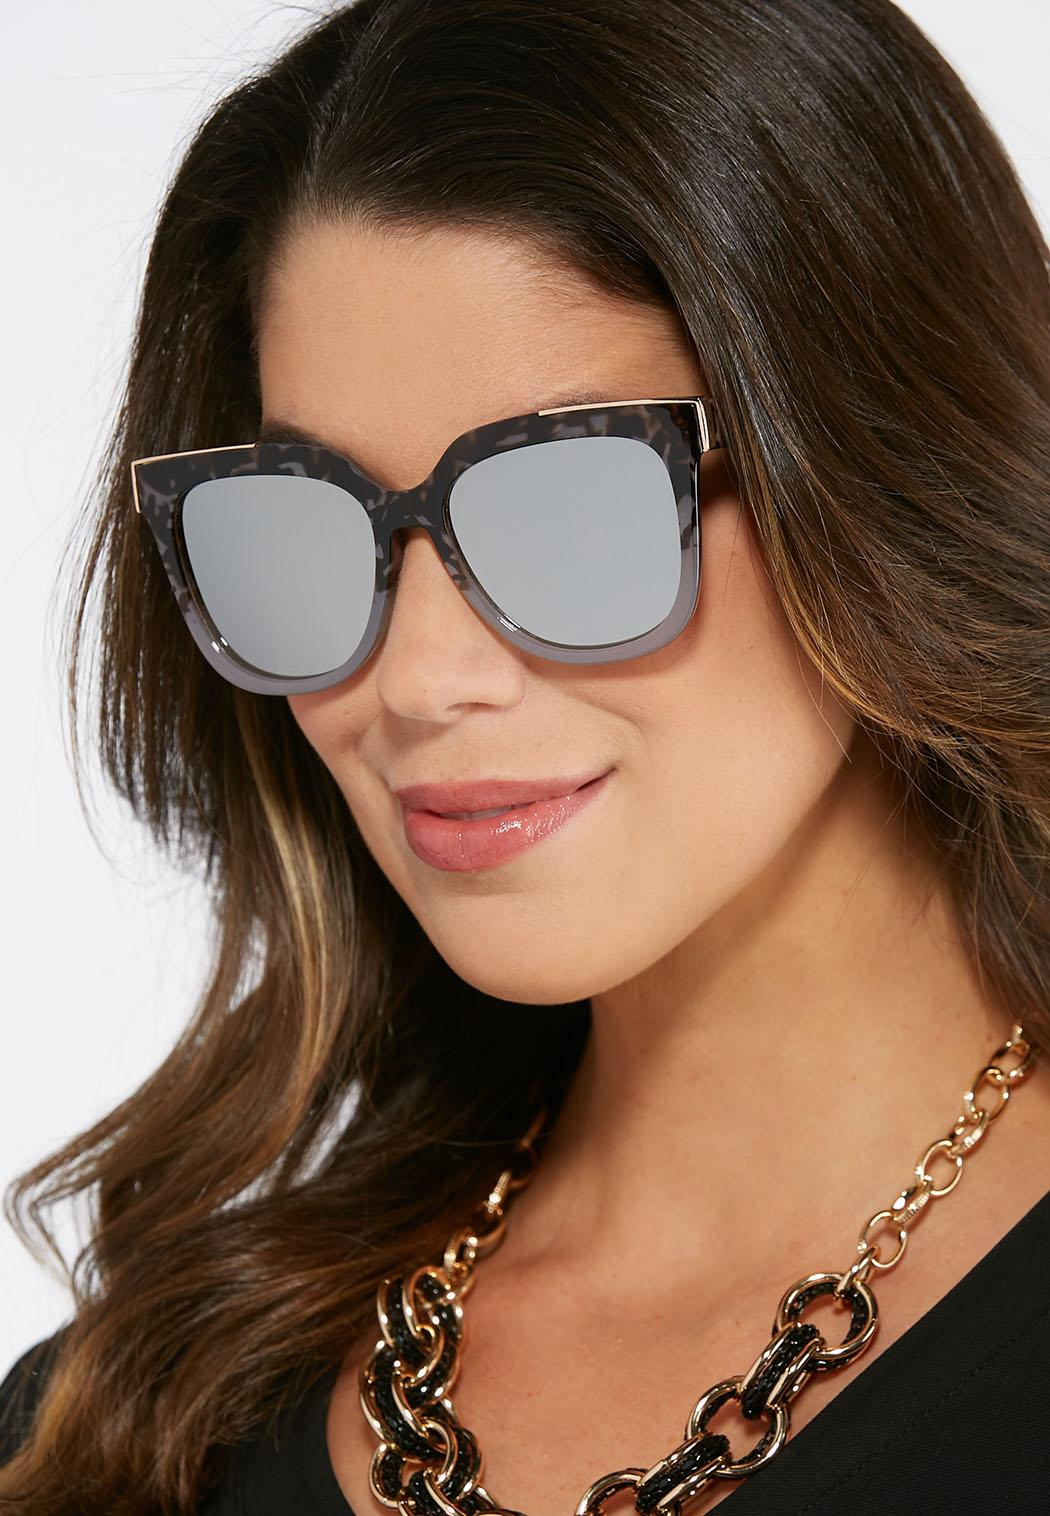 d6feeb98c5 Gray Tortoise Mirrored Sunglasses Sunglasses Cato Fashions